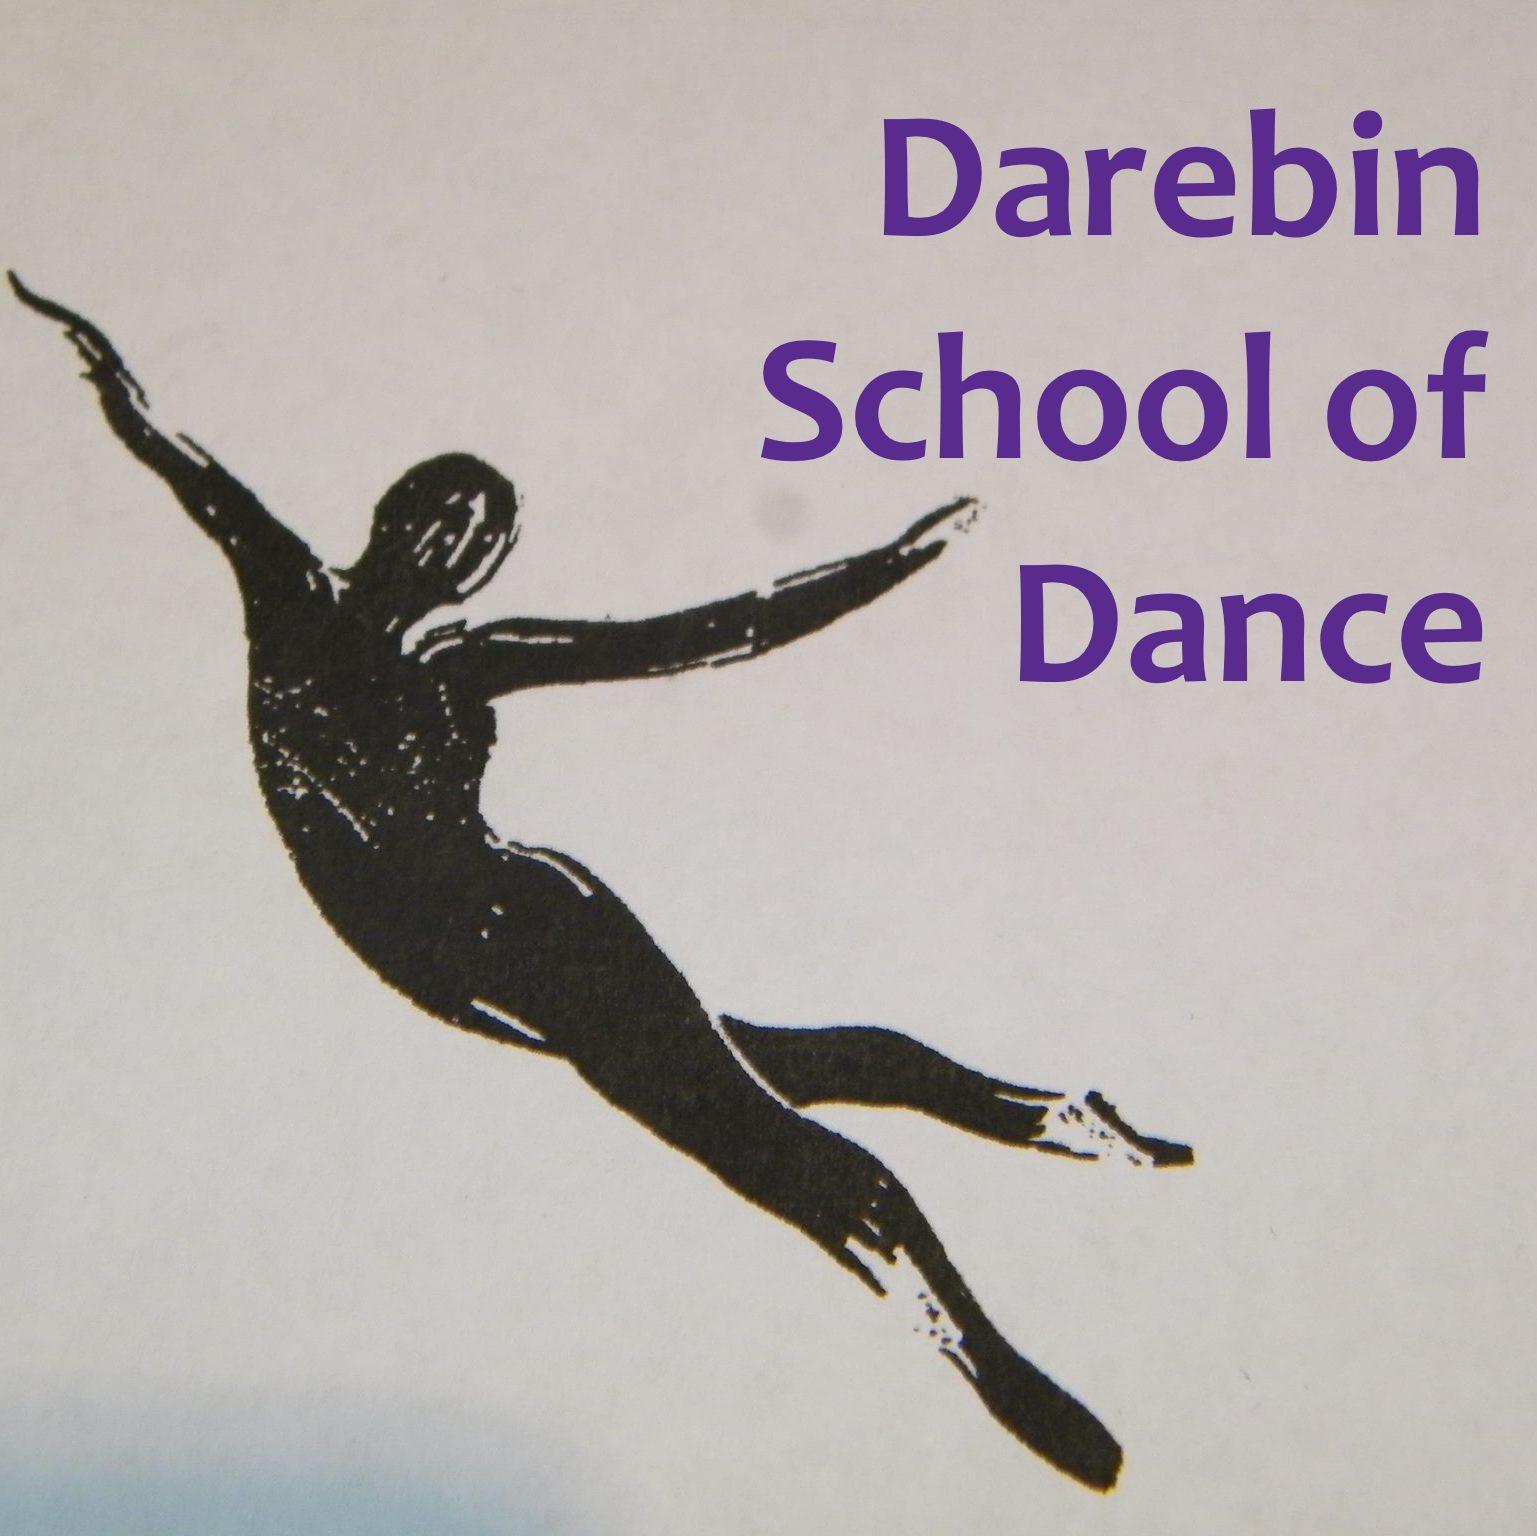 Darebin School of Dance